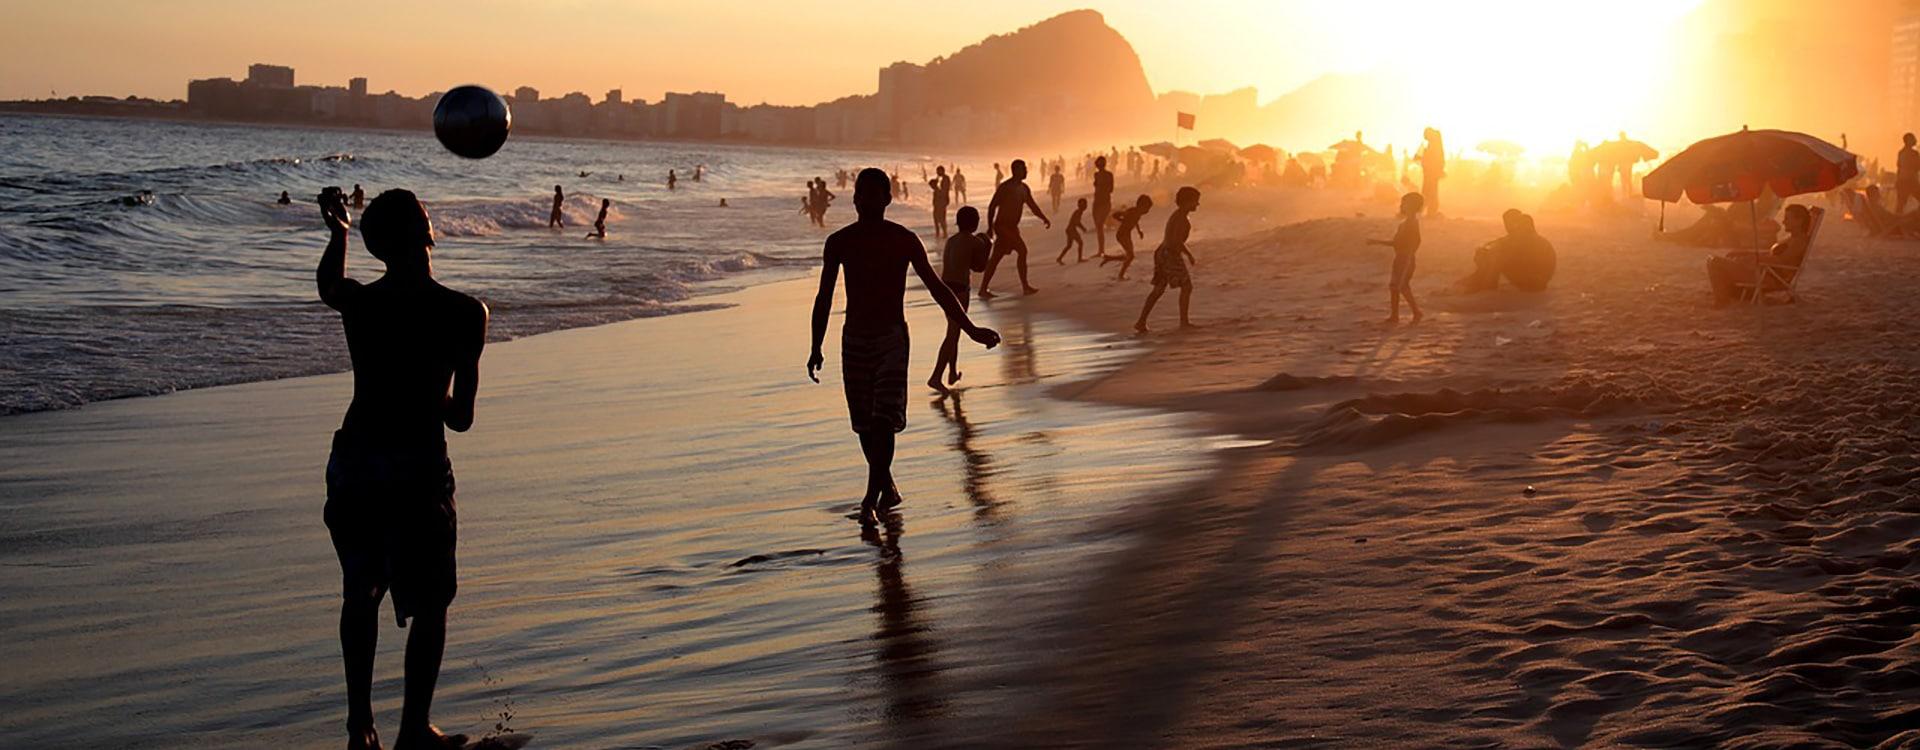 Copacabana Bresil Rio de Janeiro plage sunset foot